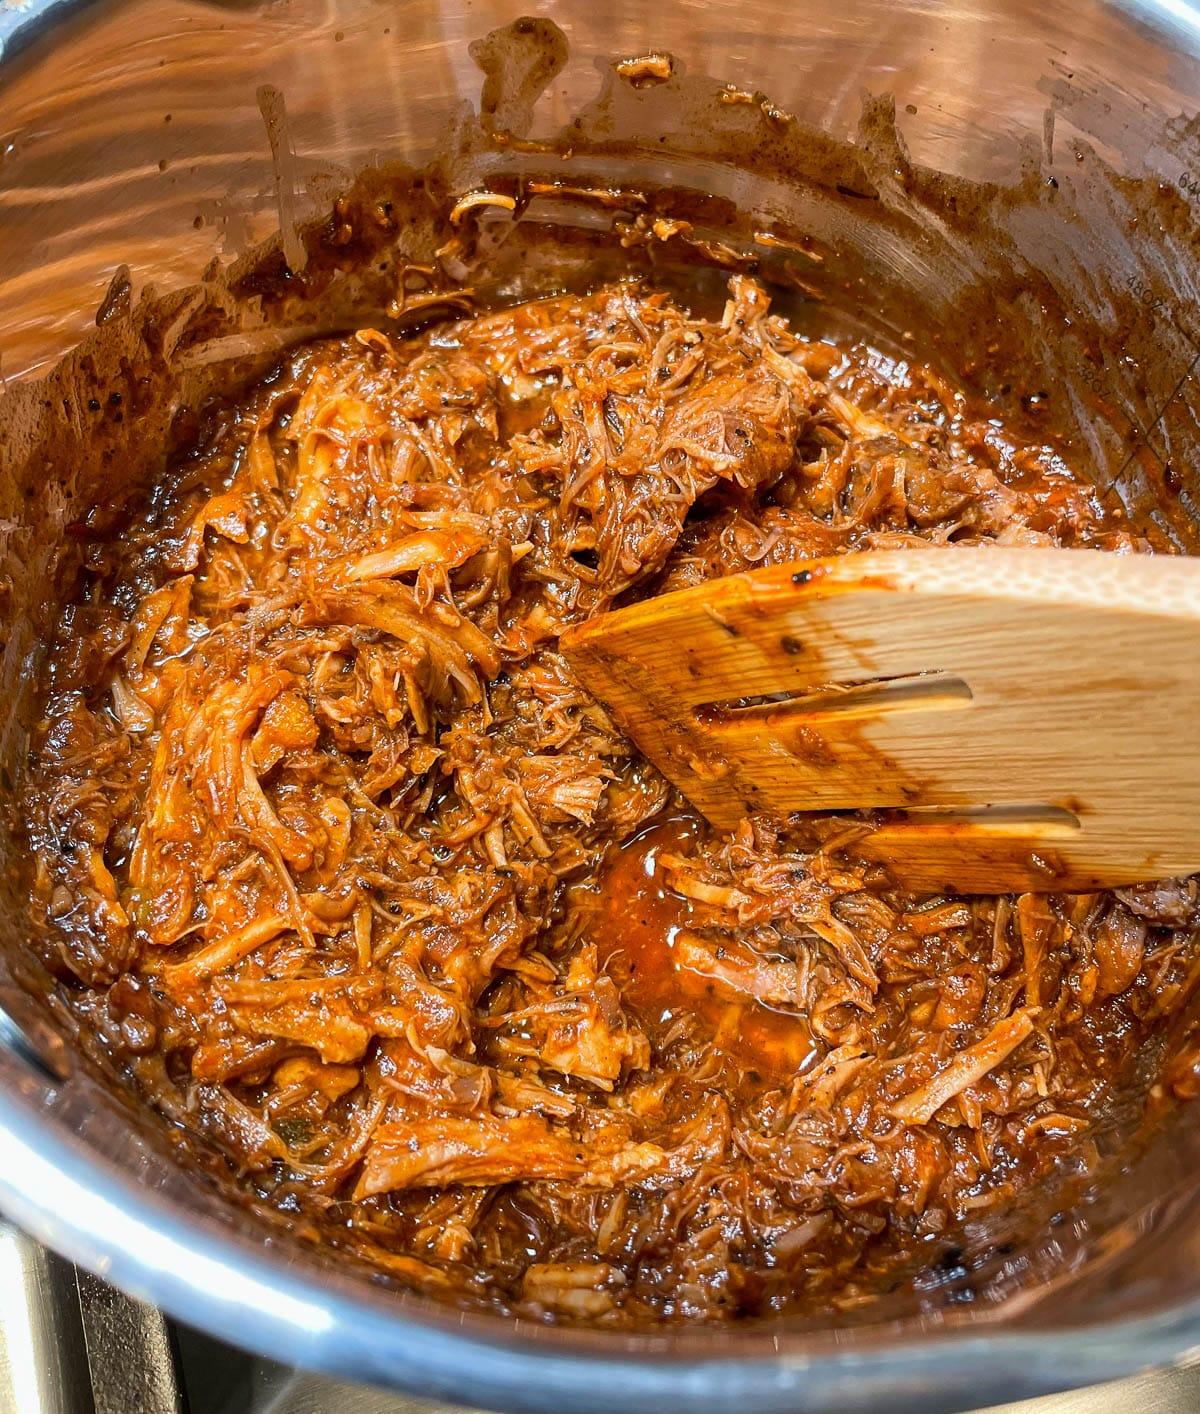 meat mixture simmering in saucepan